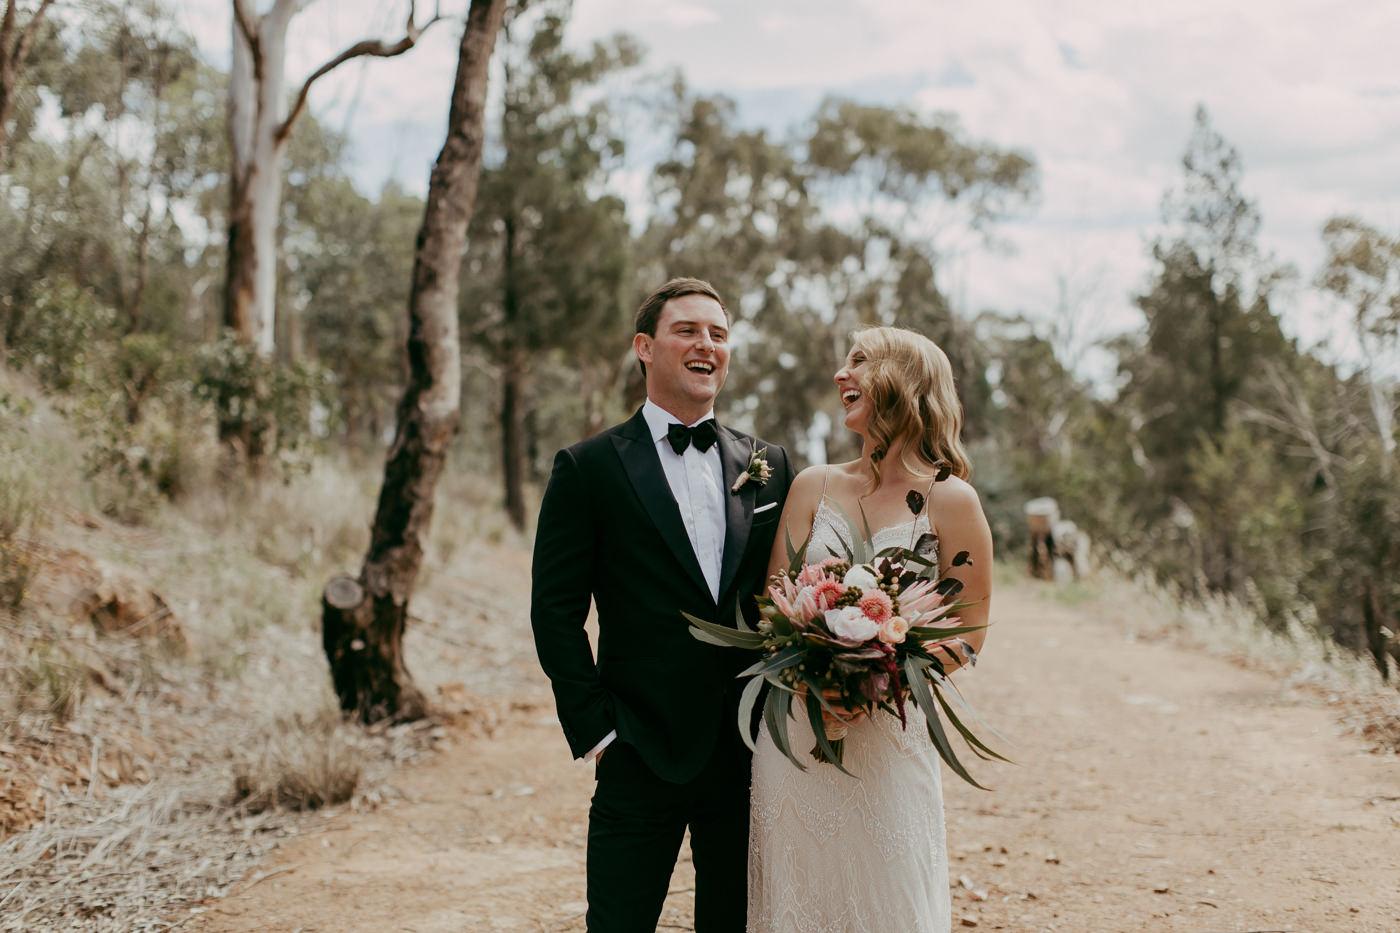 Anthony & Eliet - Wagga Wagga Wedding - Country NSW - Samantha Heather Photography-52.jpg